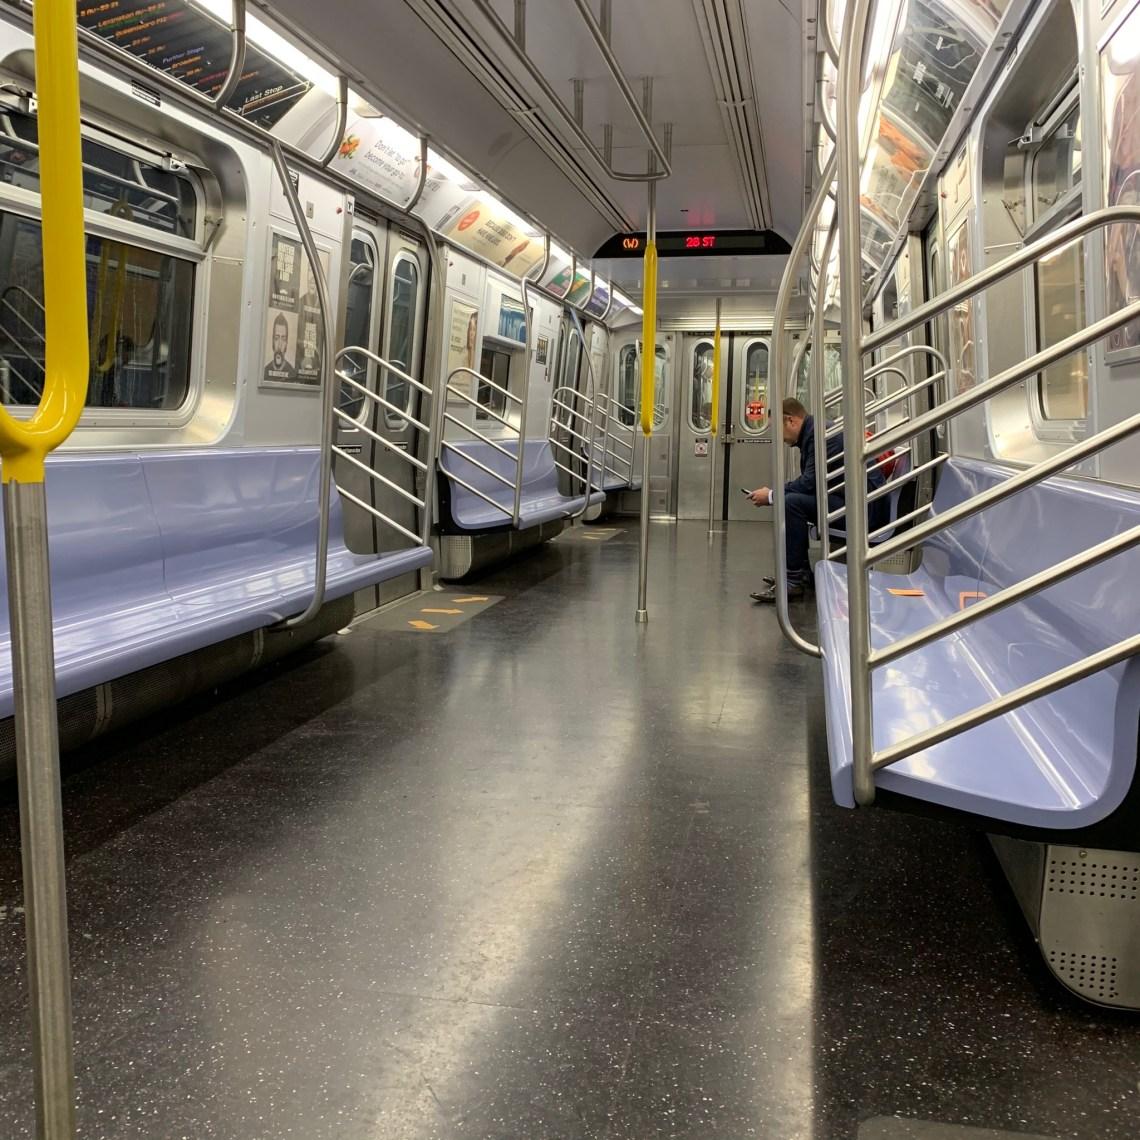 Vagone della metropolitana.